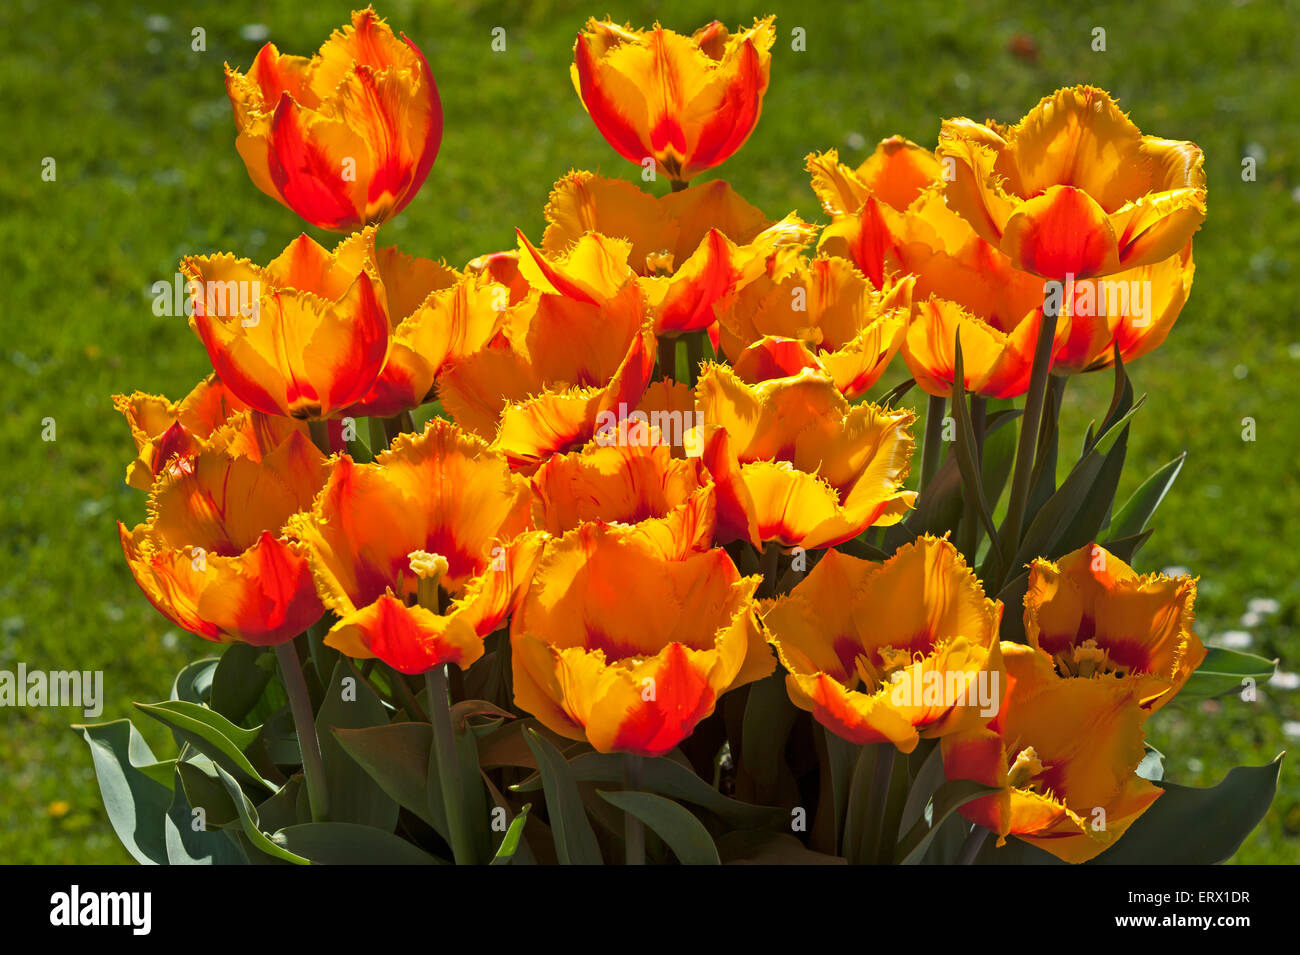 Flowering Crispa Tulips Fringed flair (Tulipa sp.), Baden-Württemberg, Germany - Stock Image